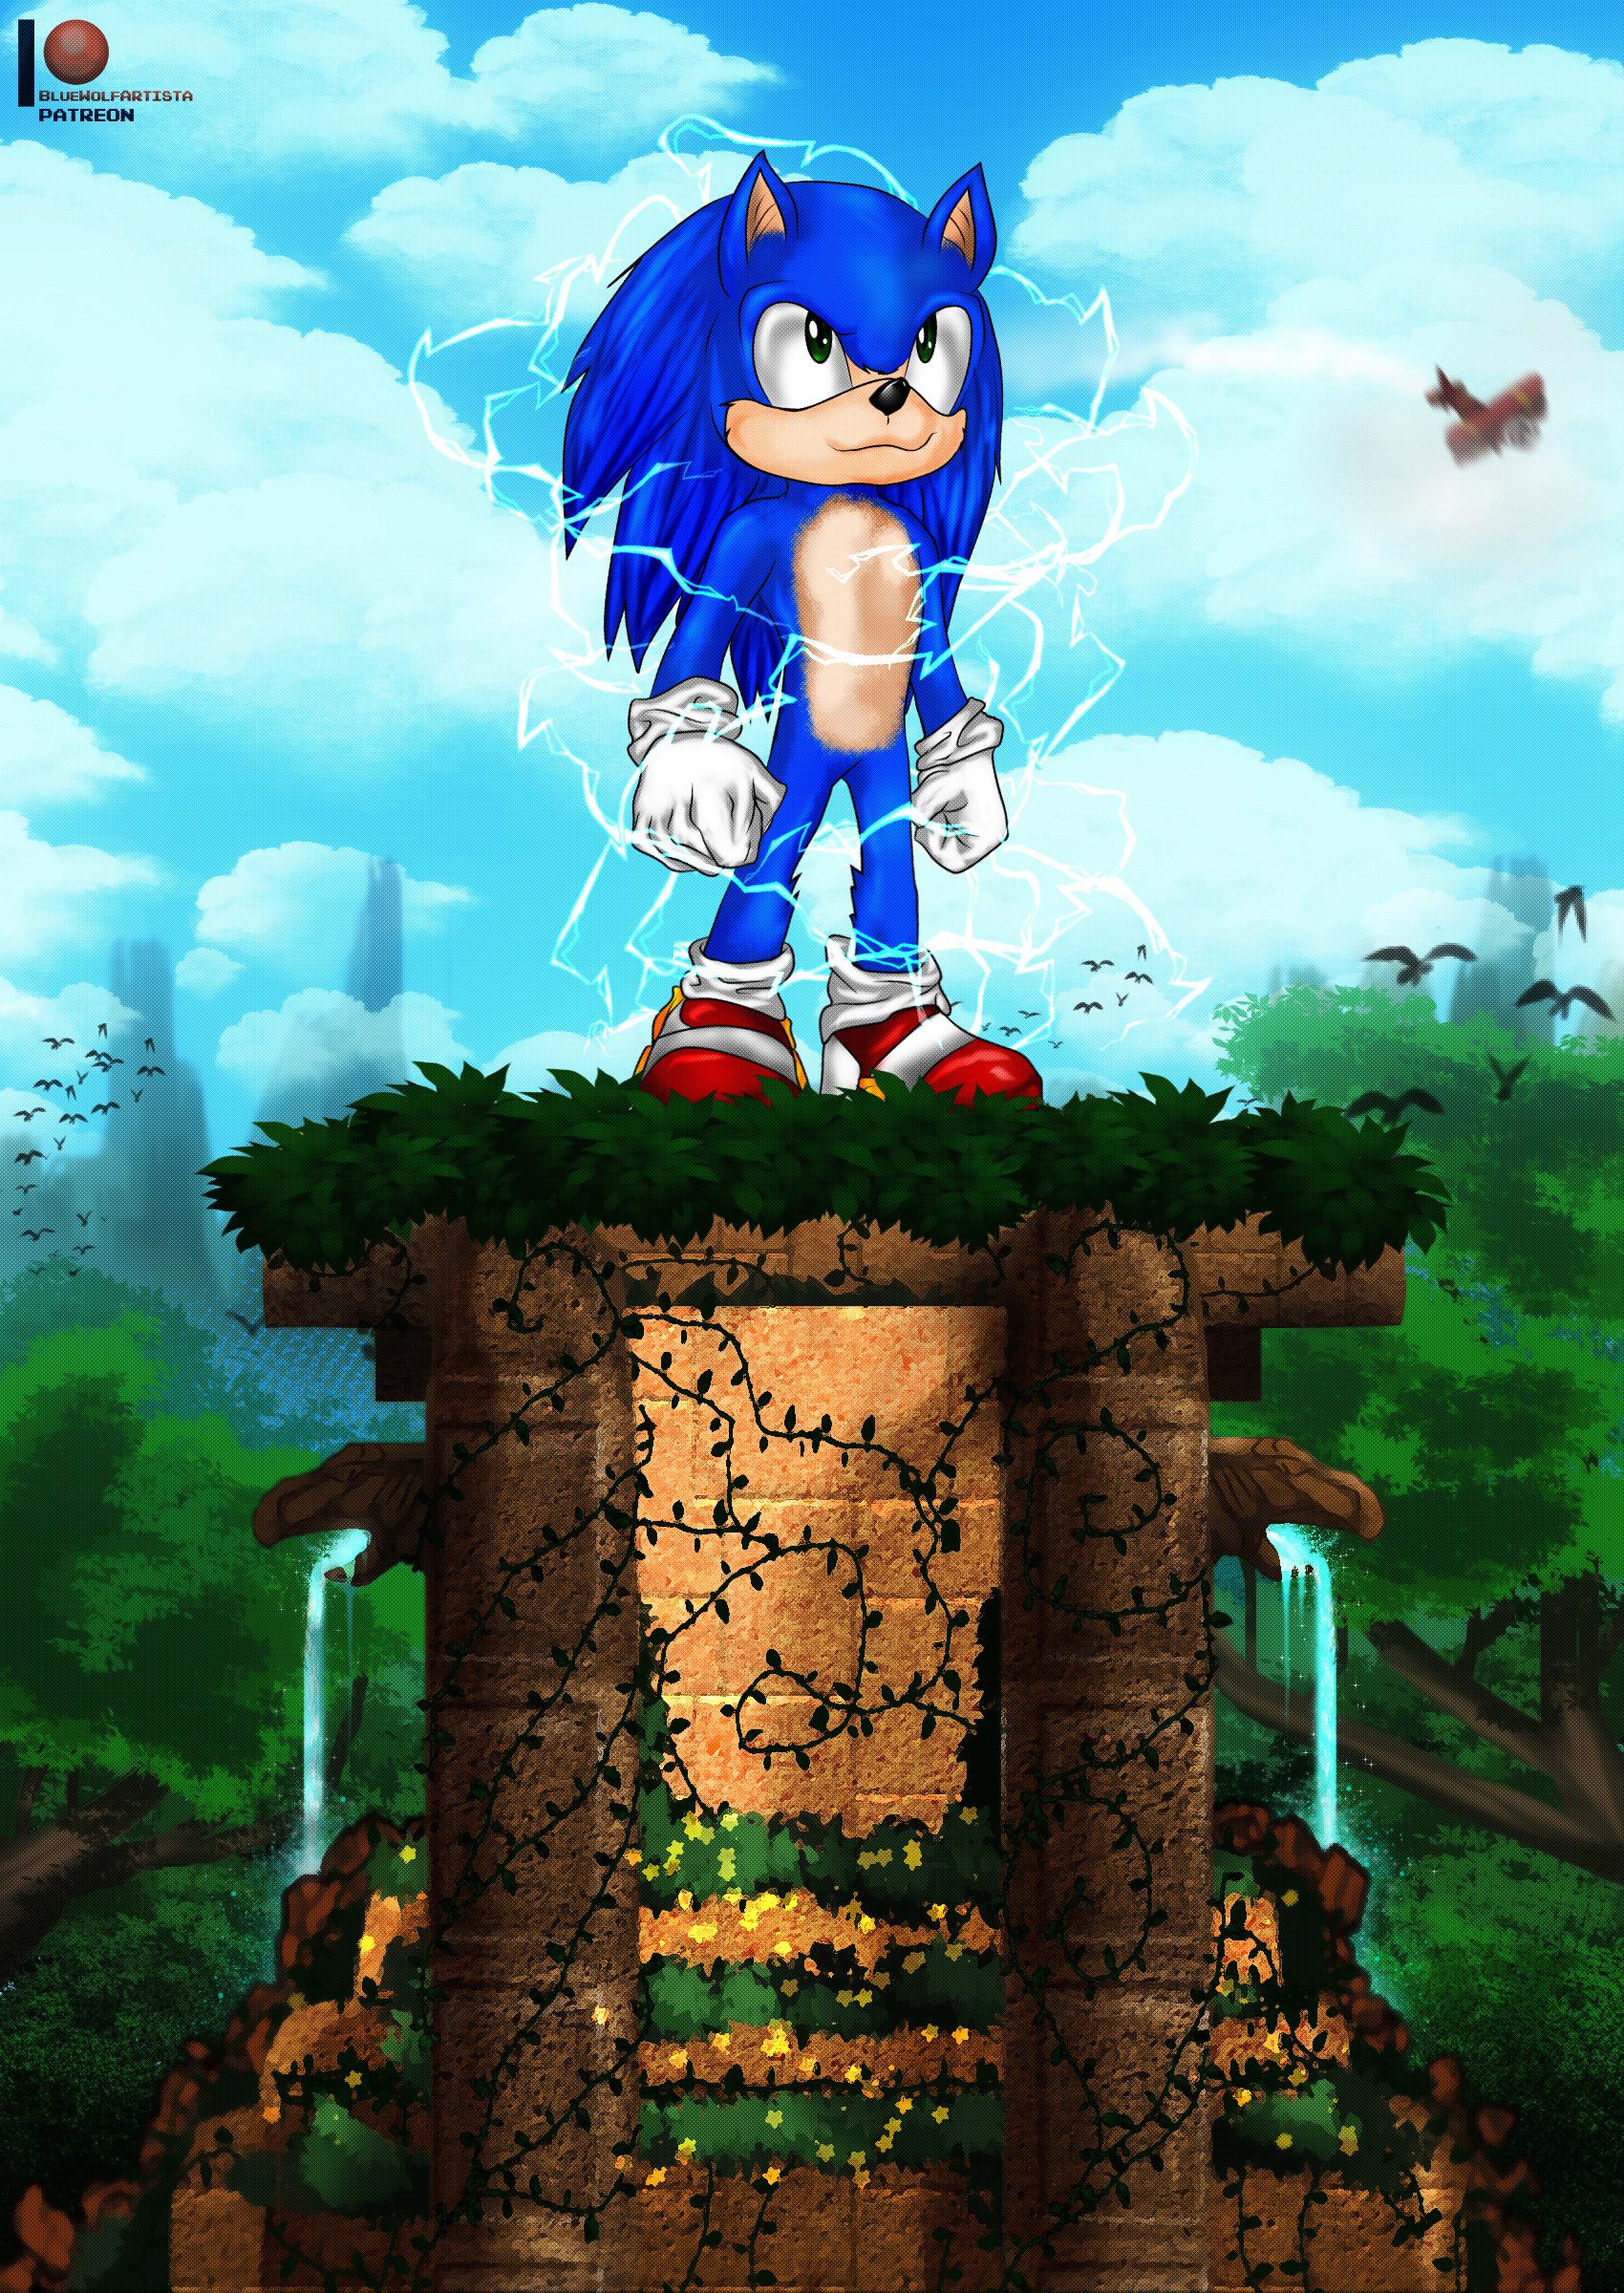 Artstation Sonic The Hedgehog Sonic The Hedgehog Movie Federico Segovia Bluewolfartista